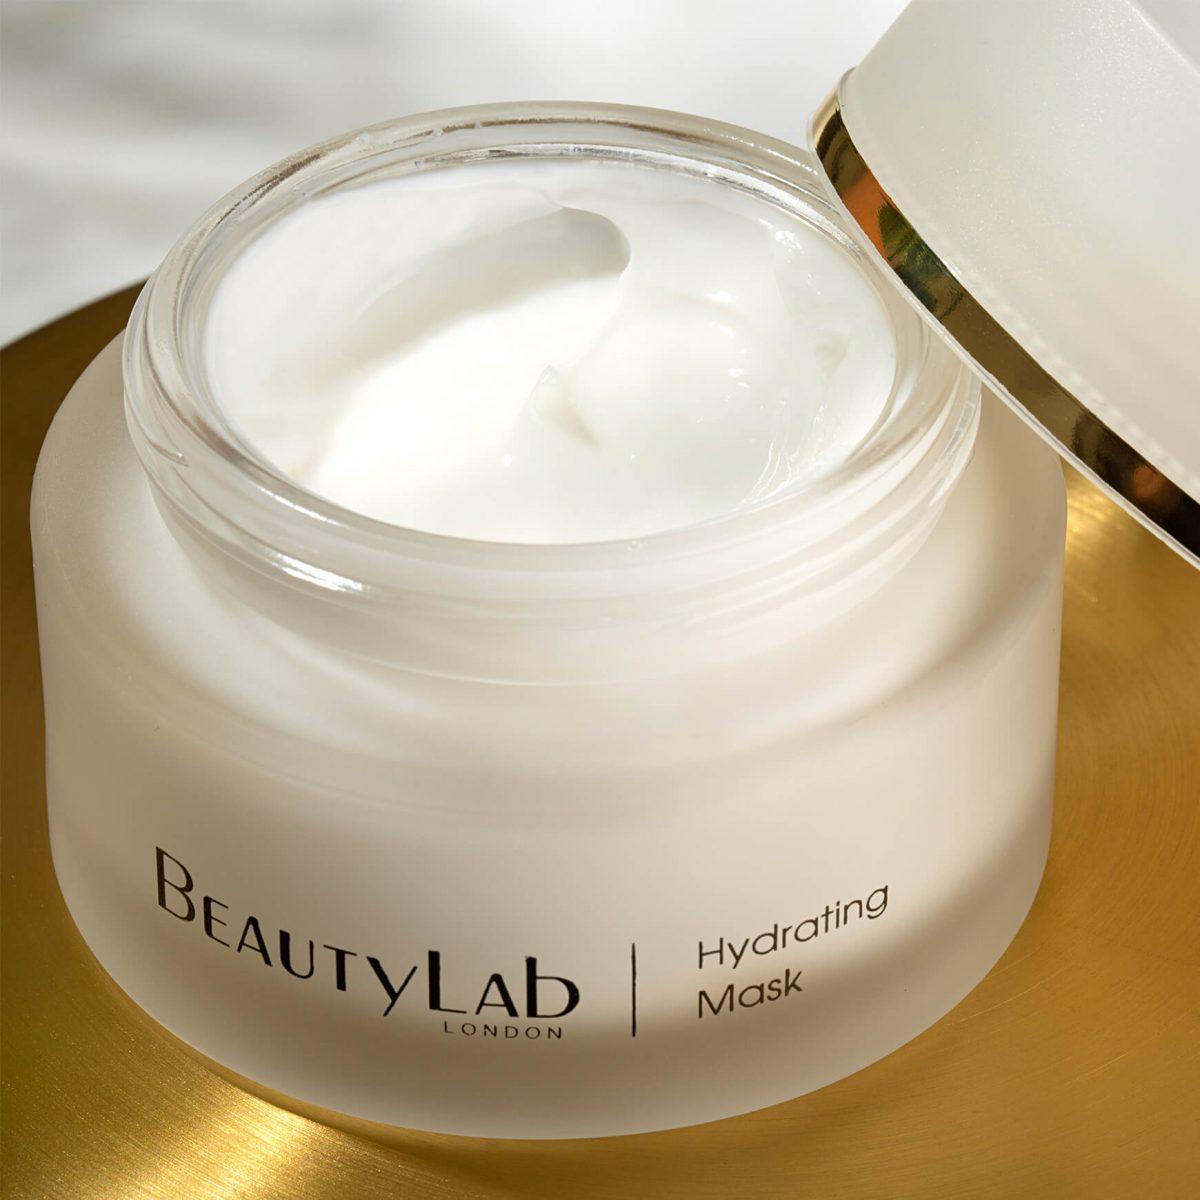 Masque hydratant anti-âge